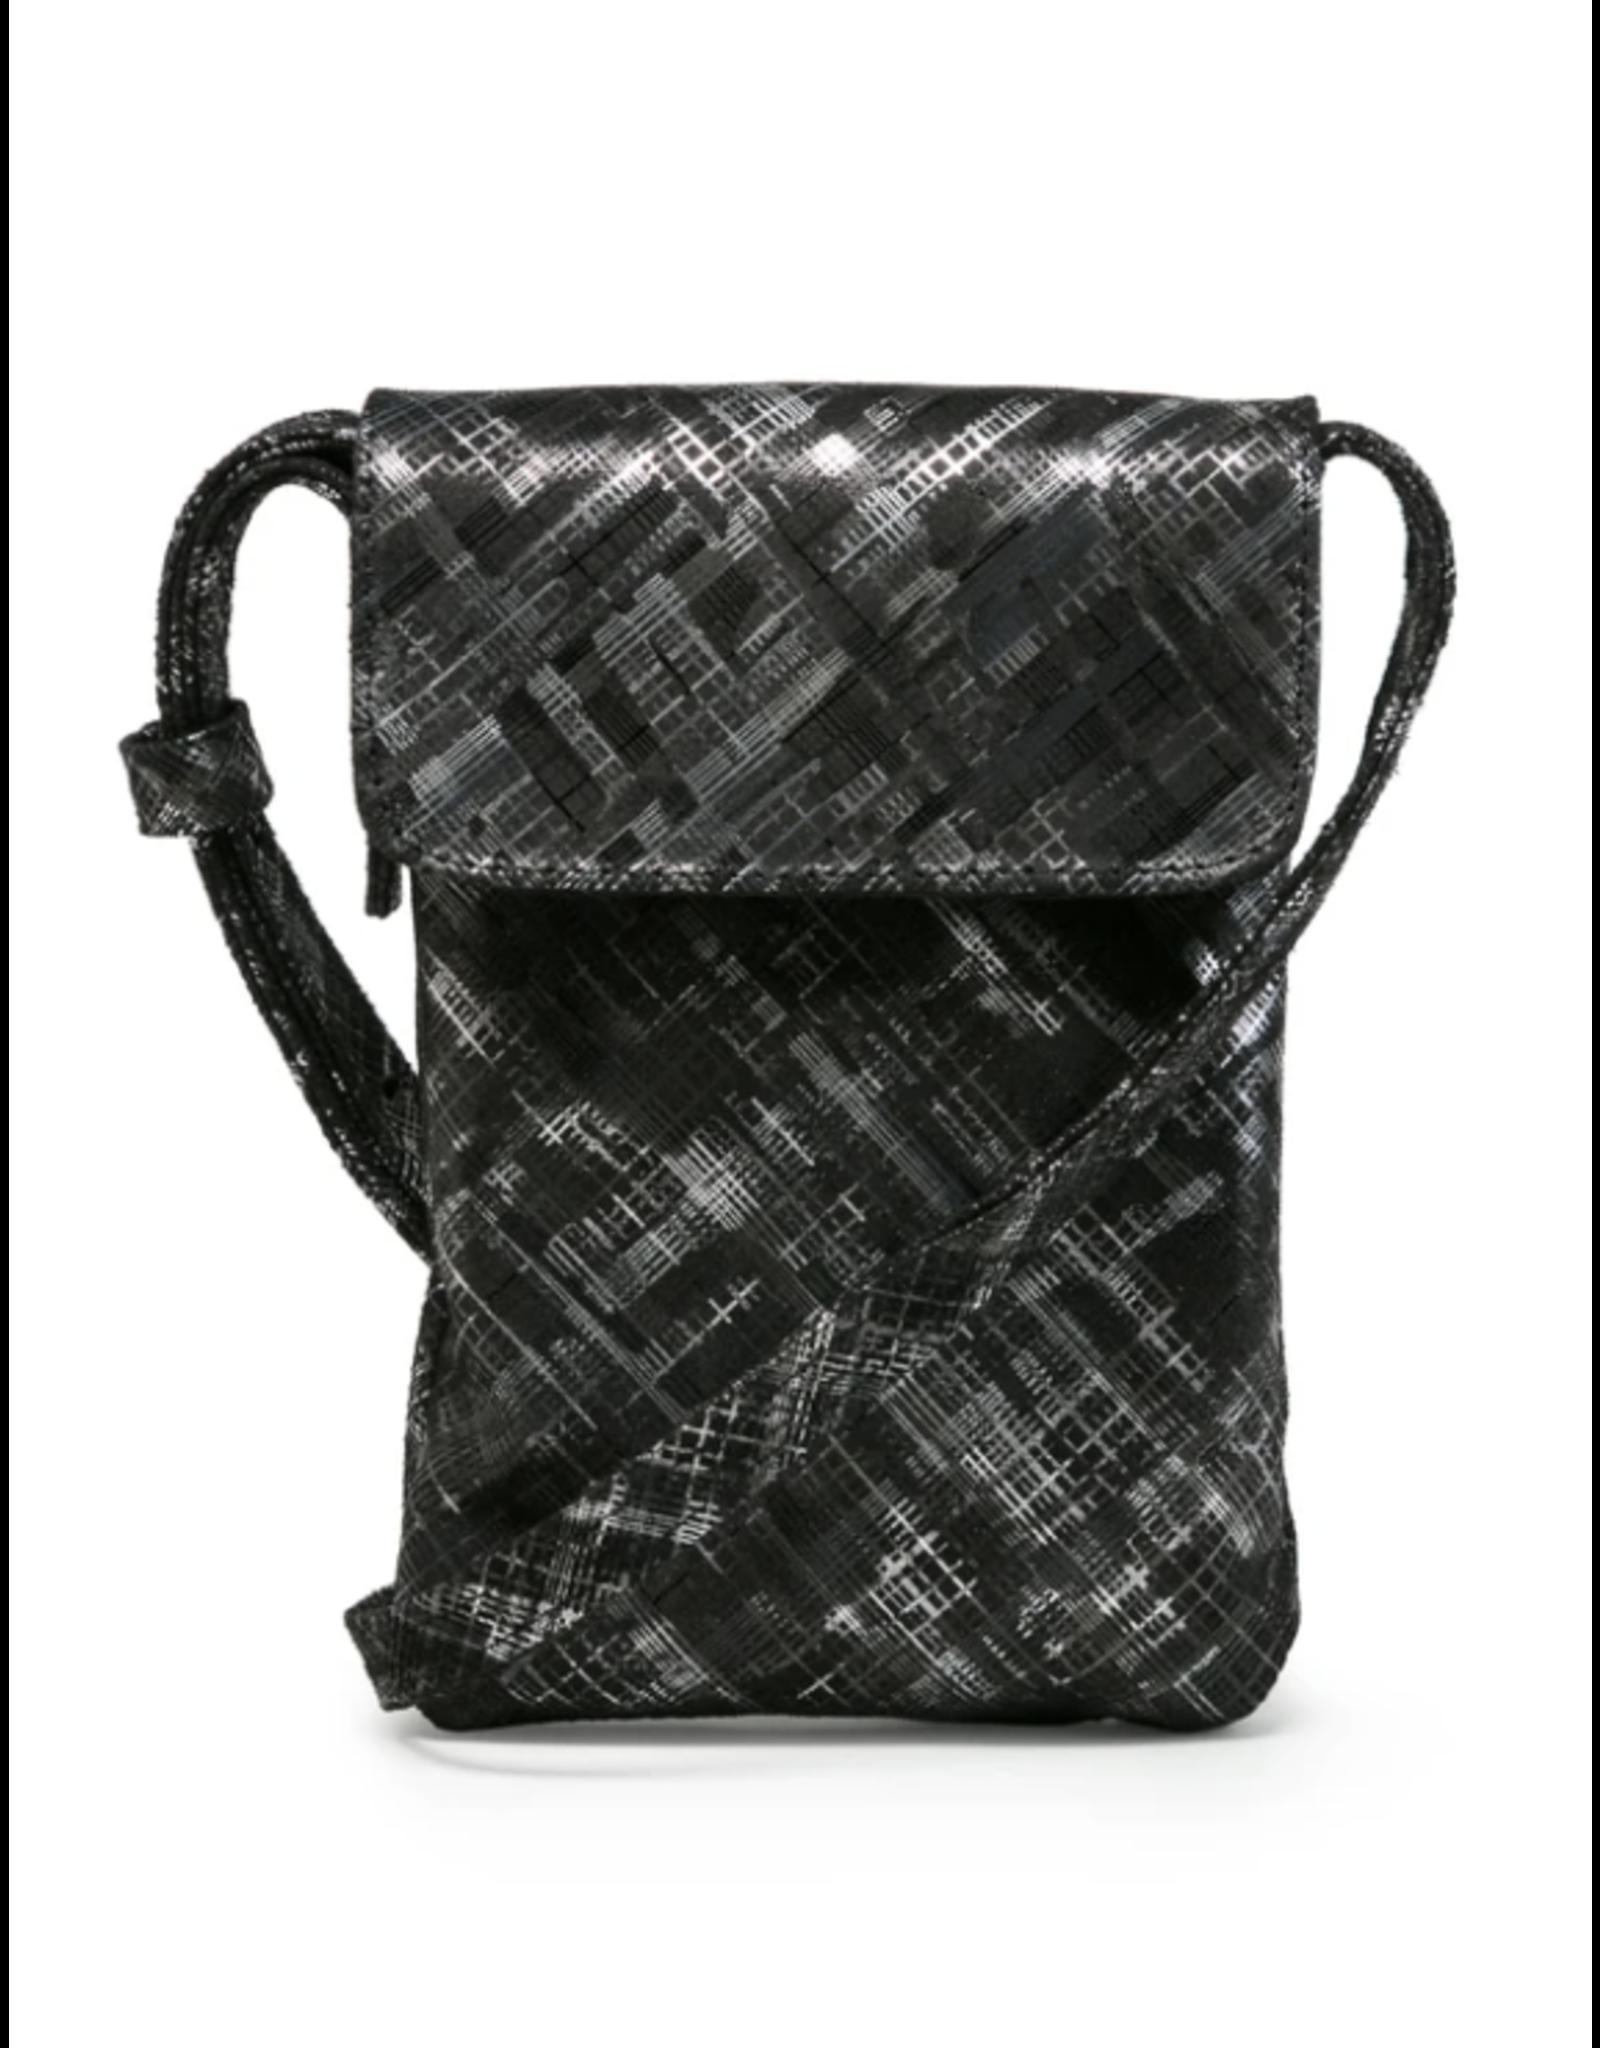 COFI Penny phone bag